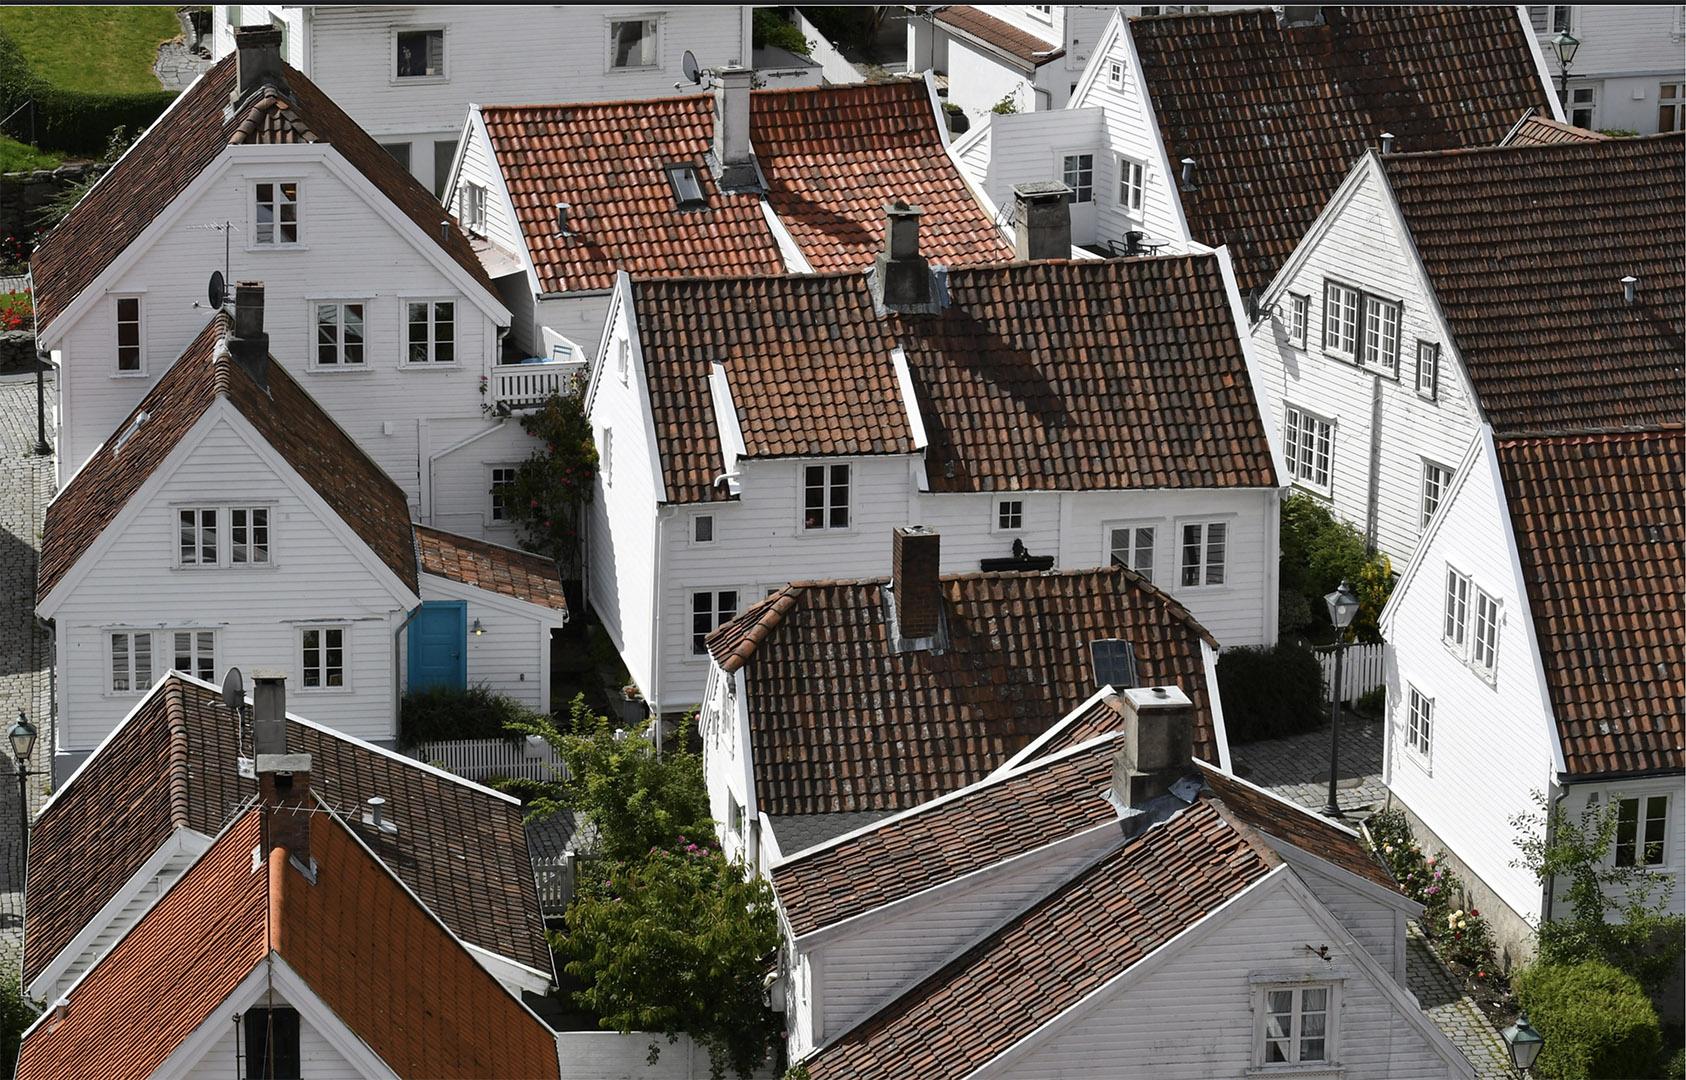 03_aerial-view_Stavanger